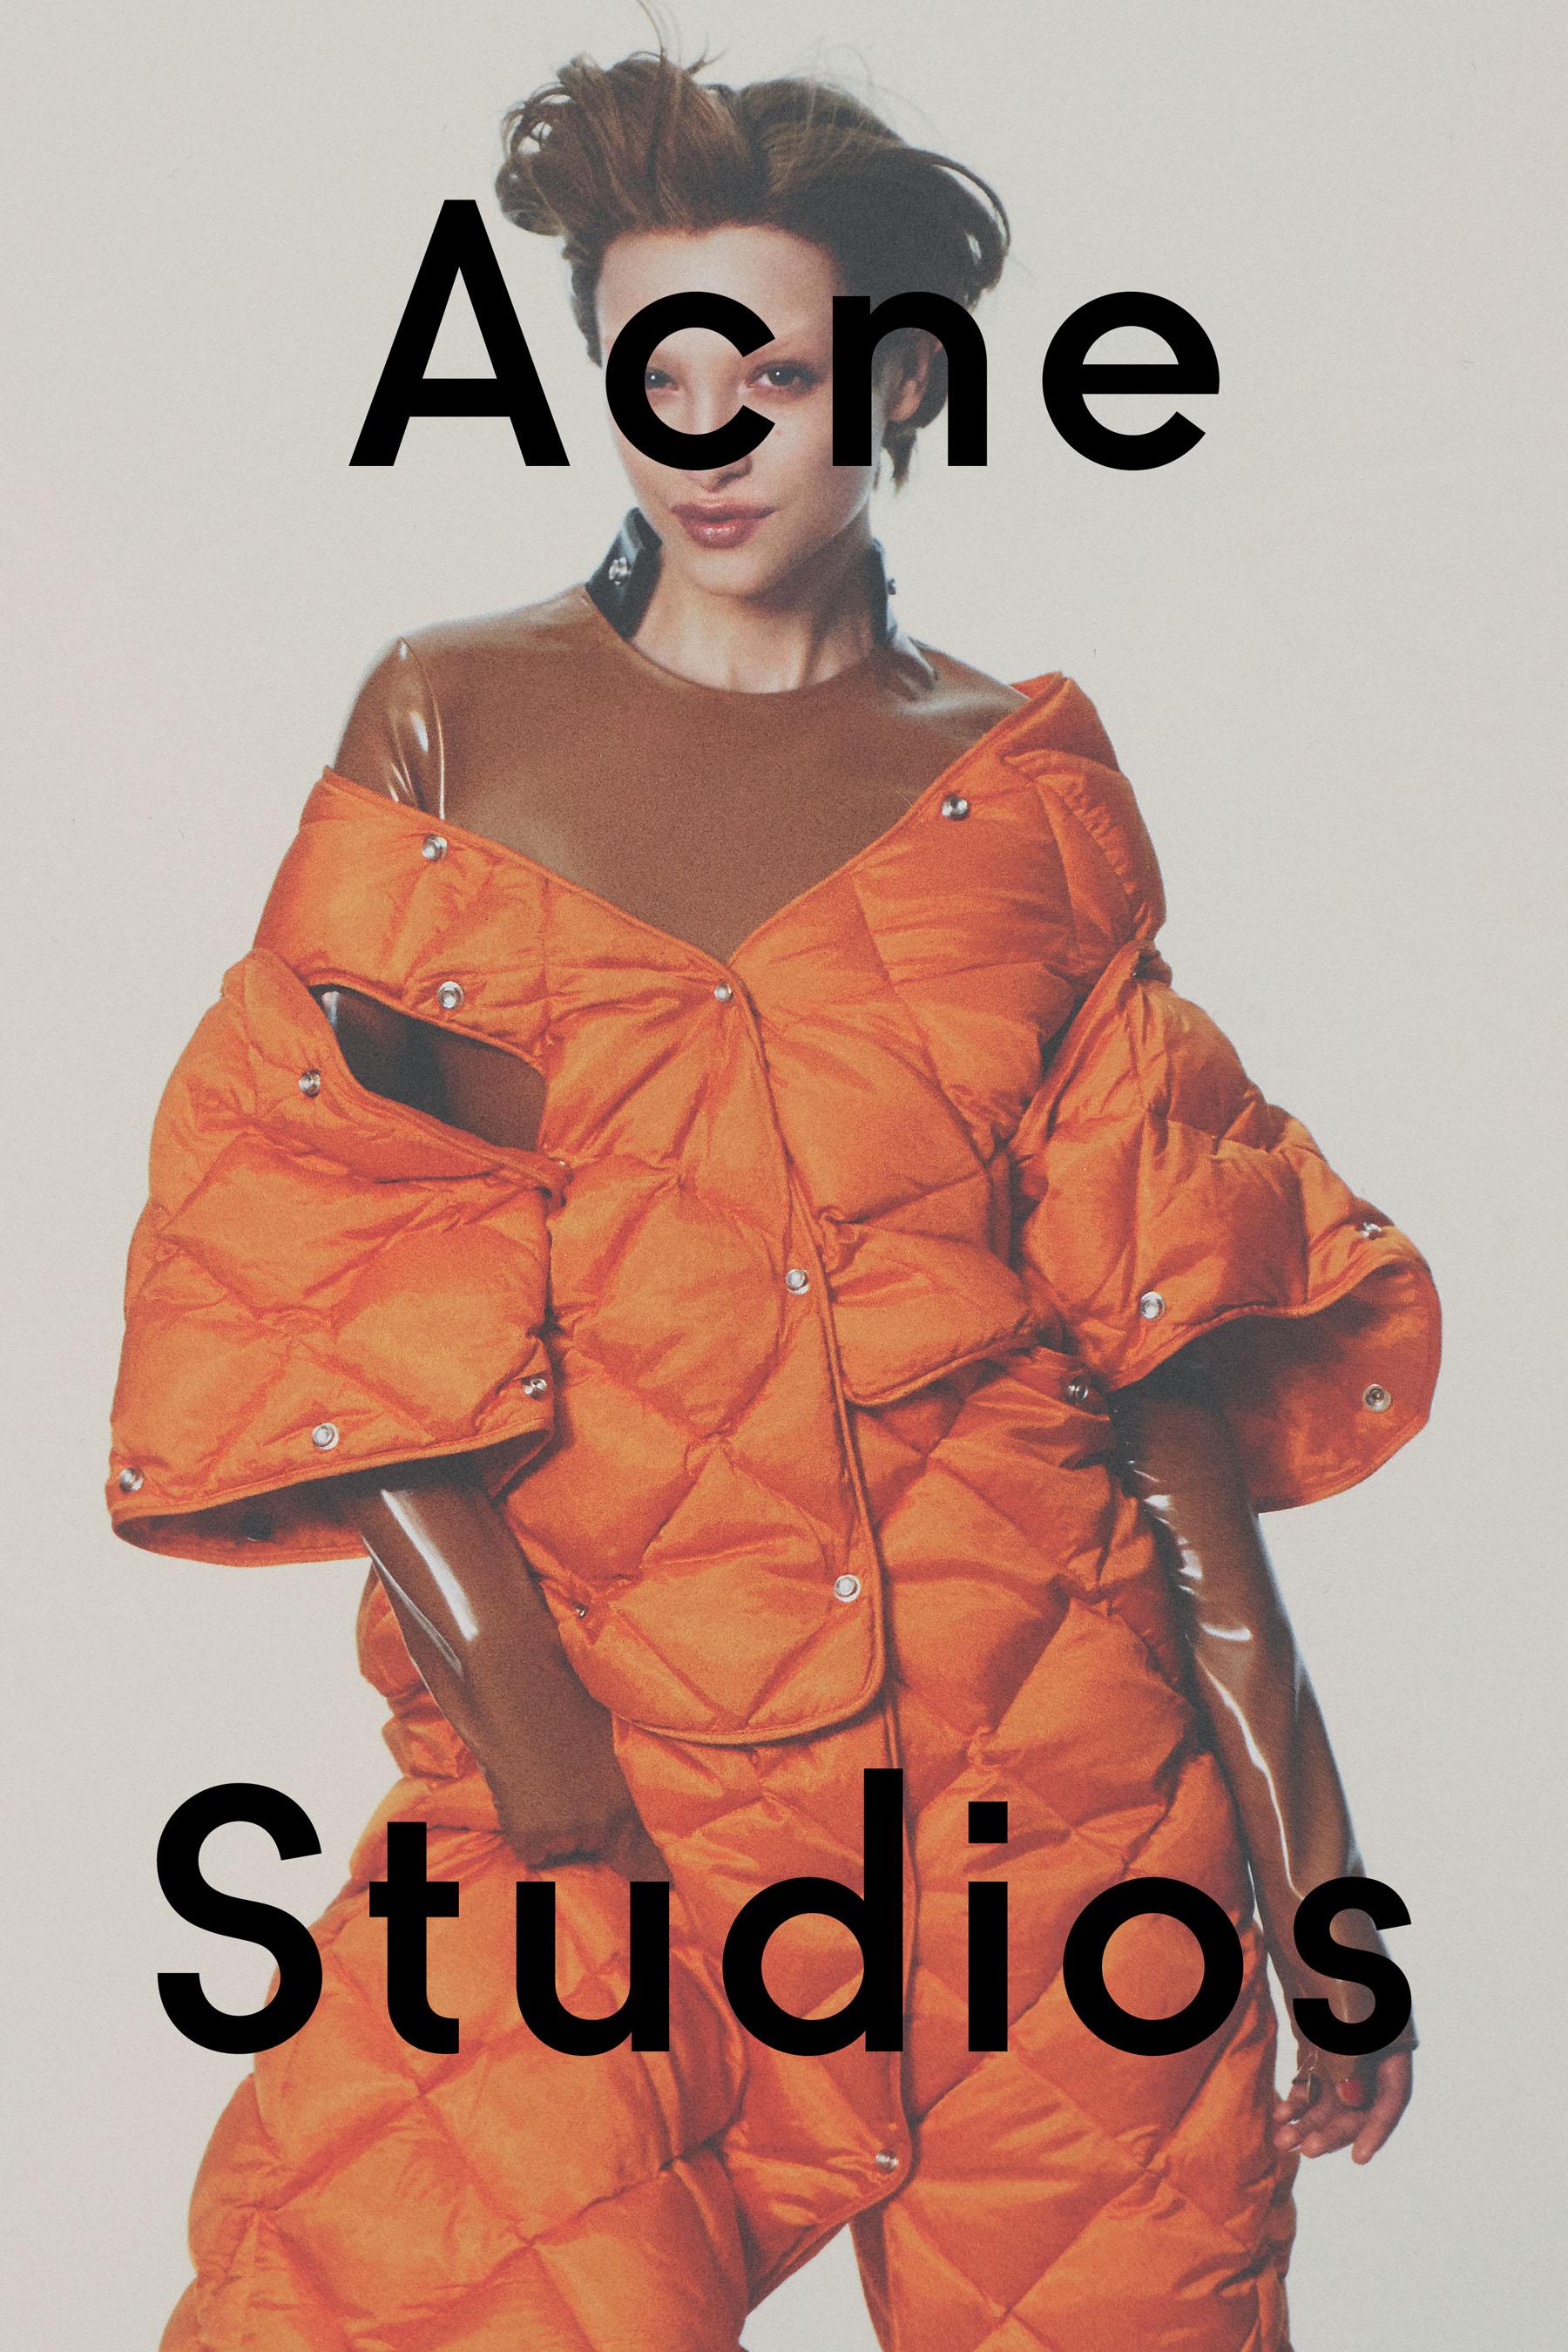 David Sims On a Classical Fashion Campaign for Acne Studios - Anniversary Magazine